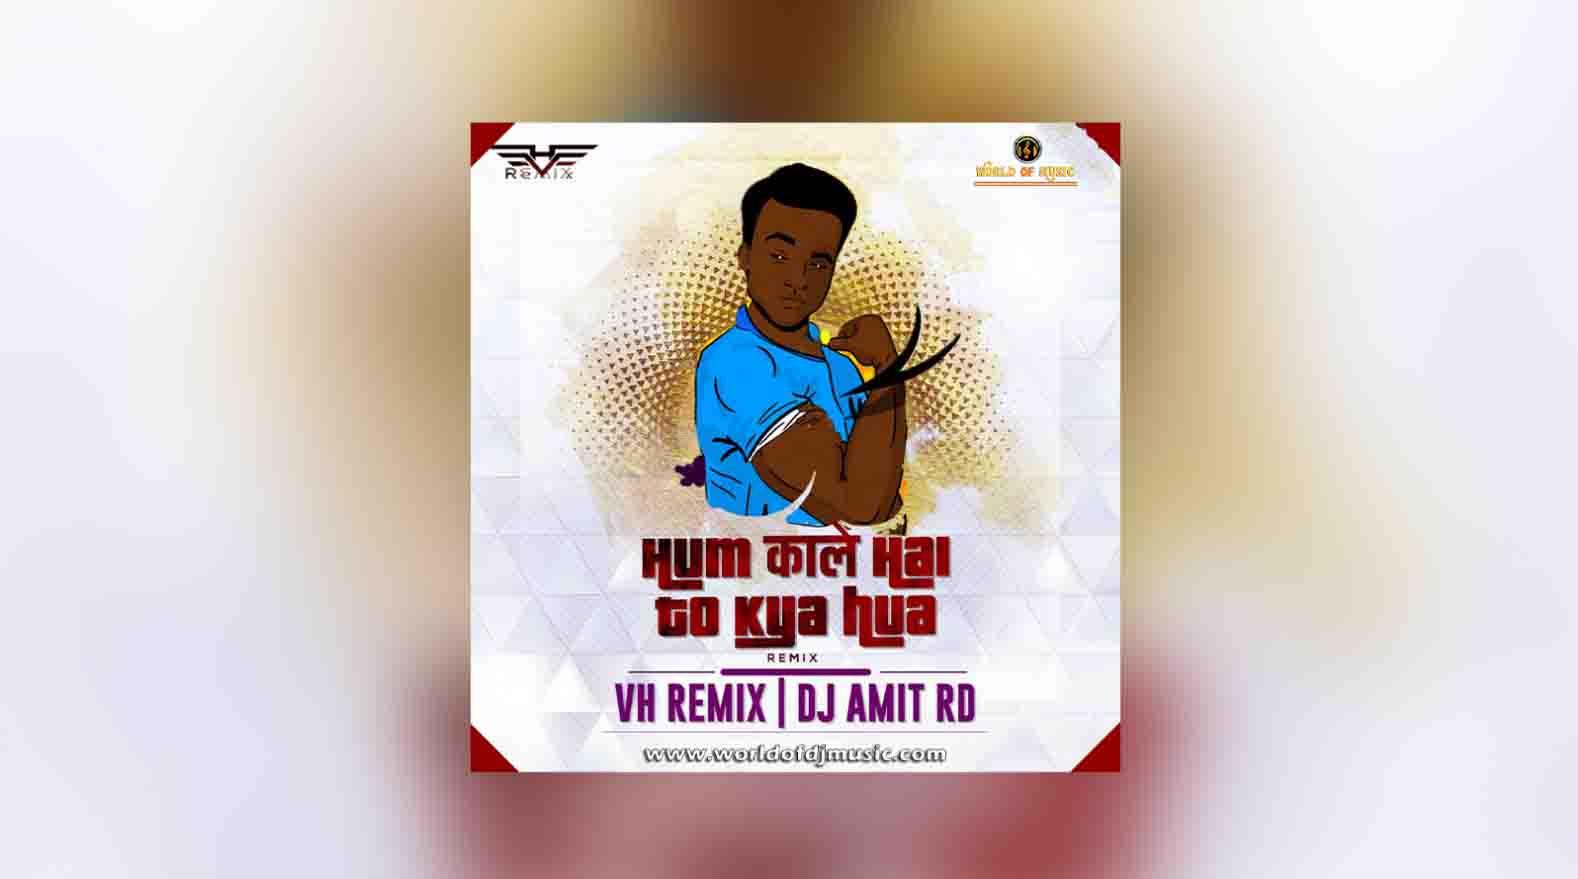 Hum Kale Hai To Kya Hua (Remix) - VH & Dj Amit RD